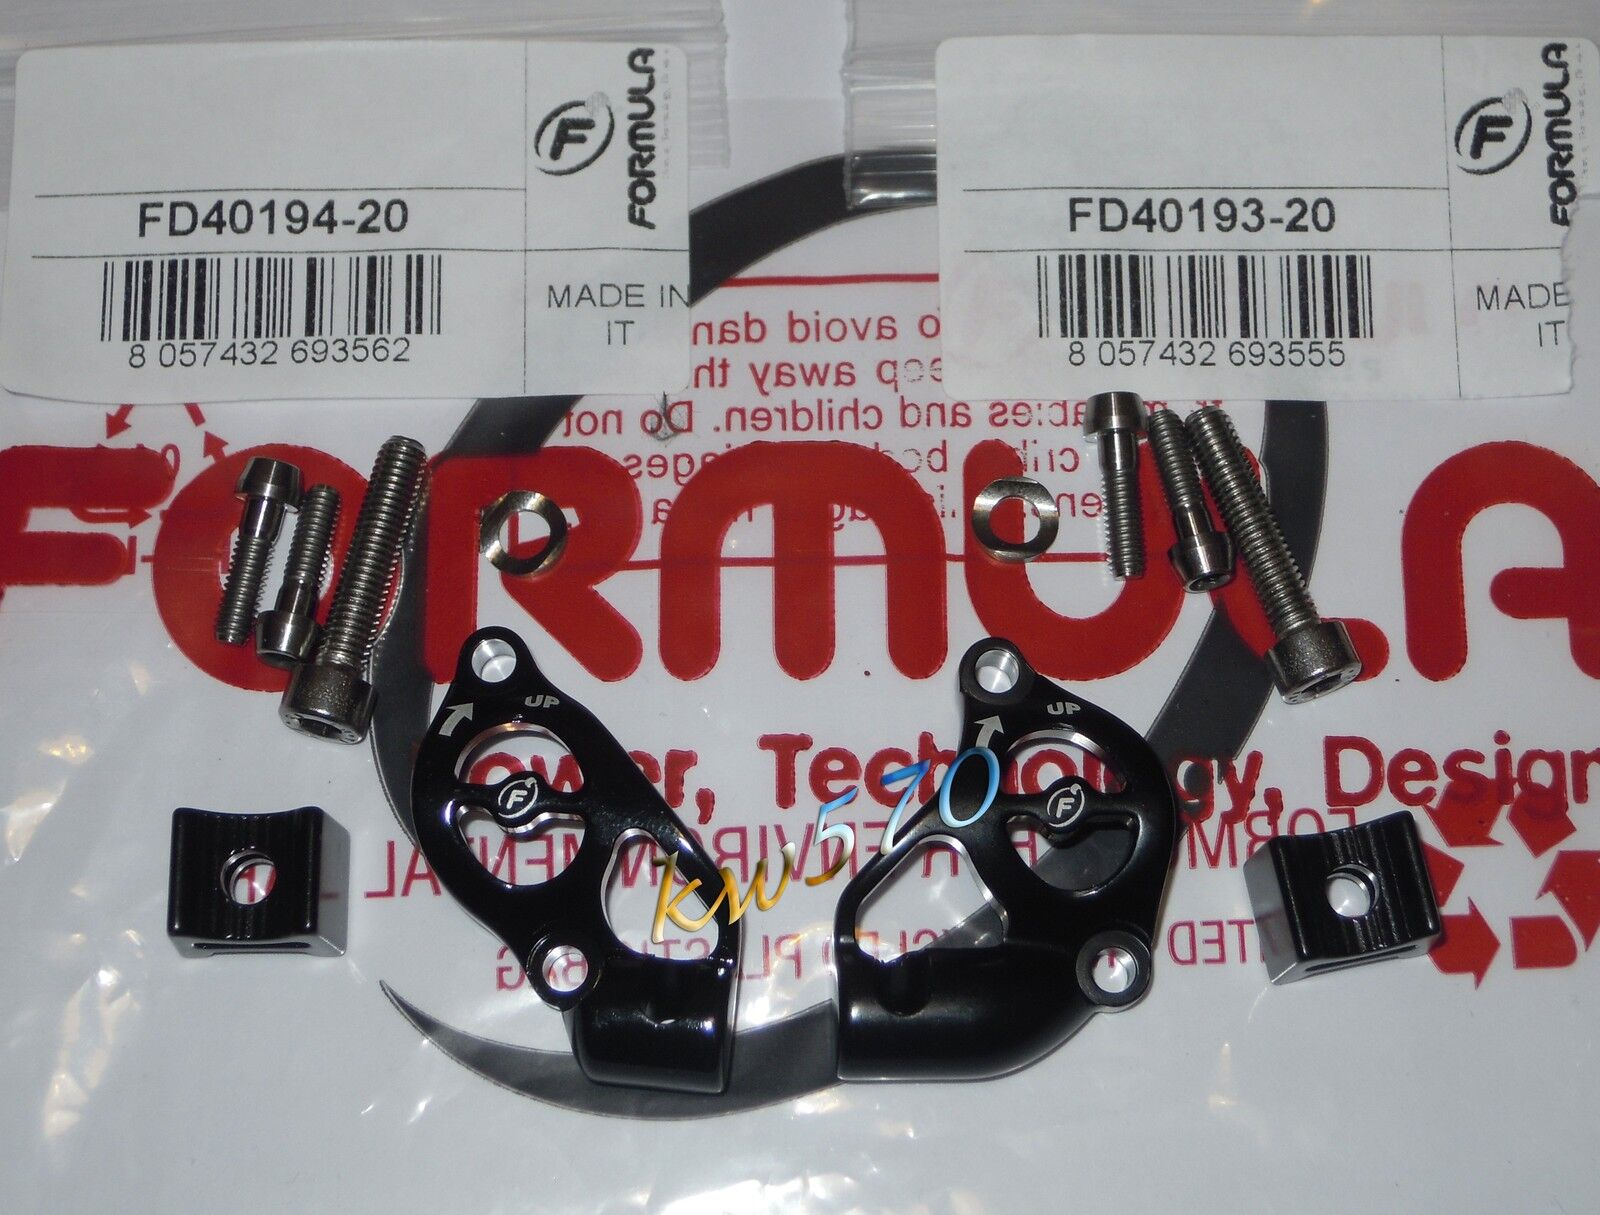 Formula  Coppia matchmaker x SRAM x R1R1RT1 titanium FD4019320 FD4019420